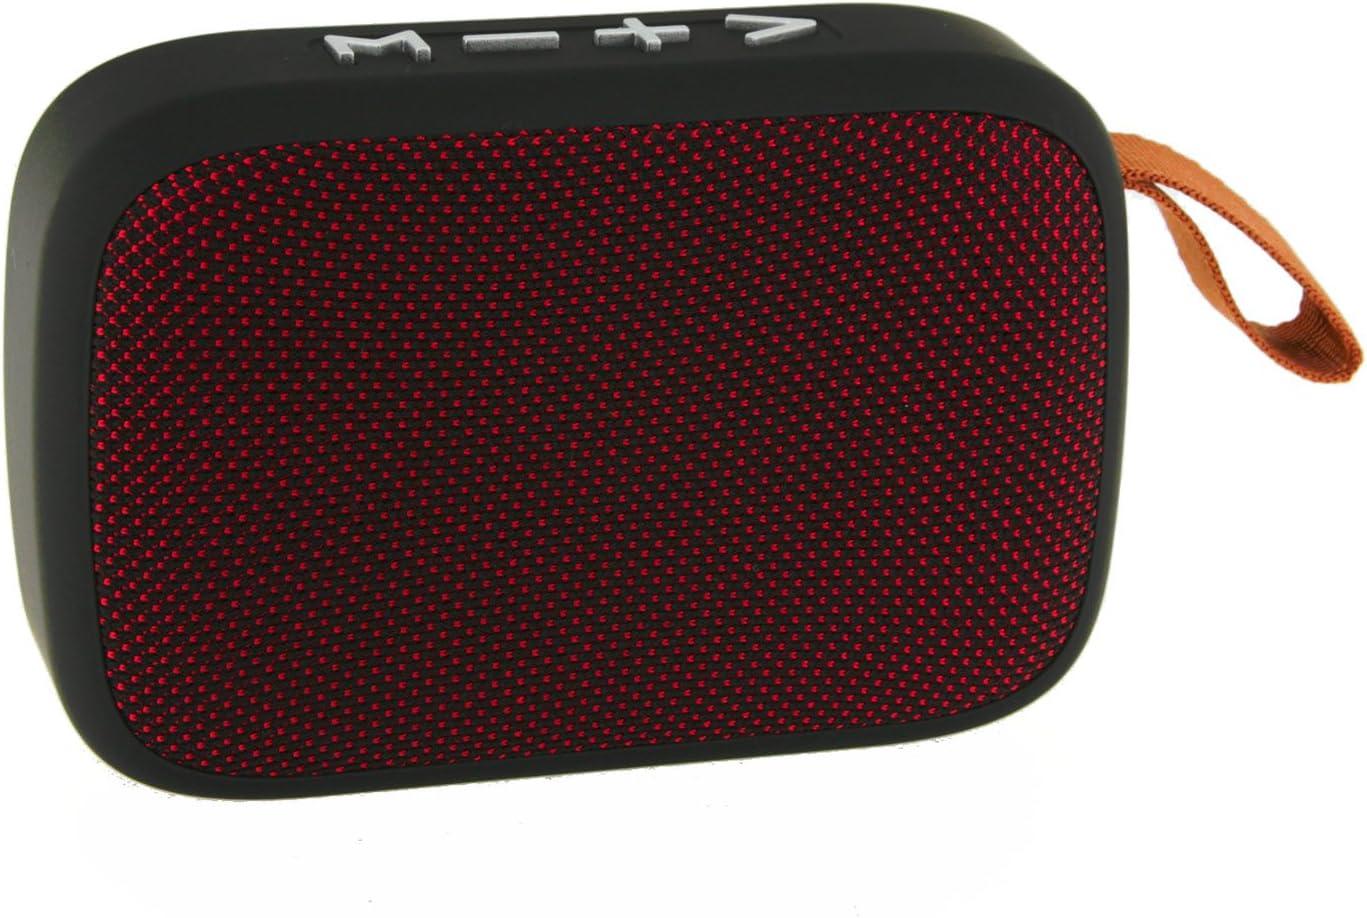 Daewoo DBT-301 R Altavoz Bluetooth Tela - Color Rojo, Pequeno